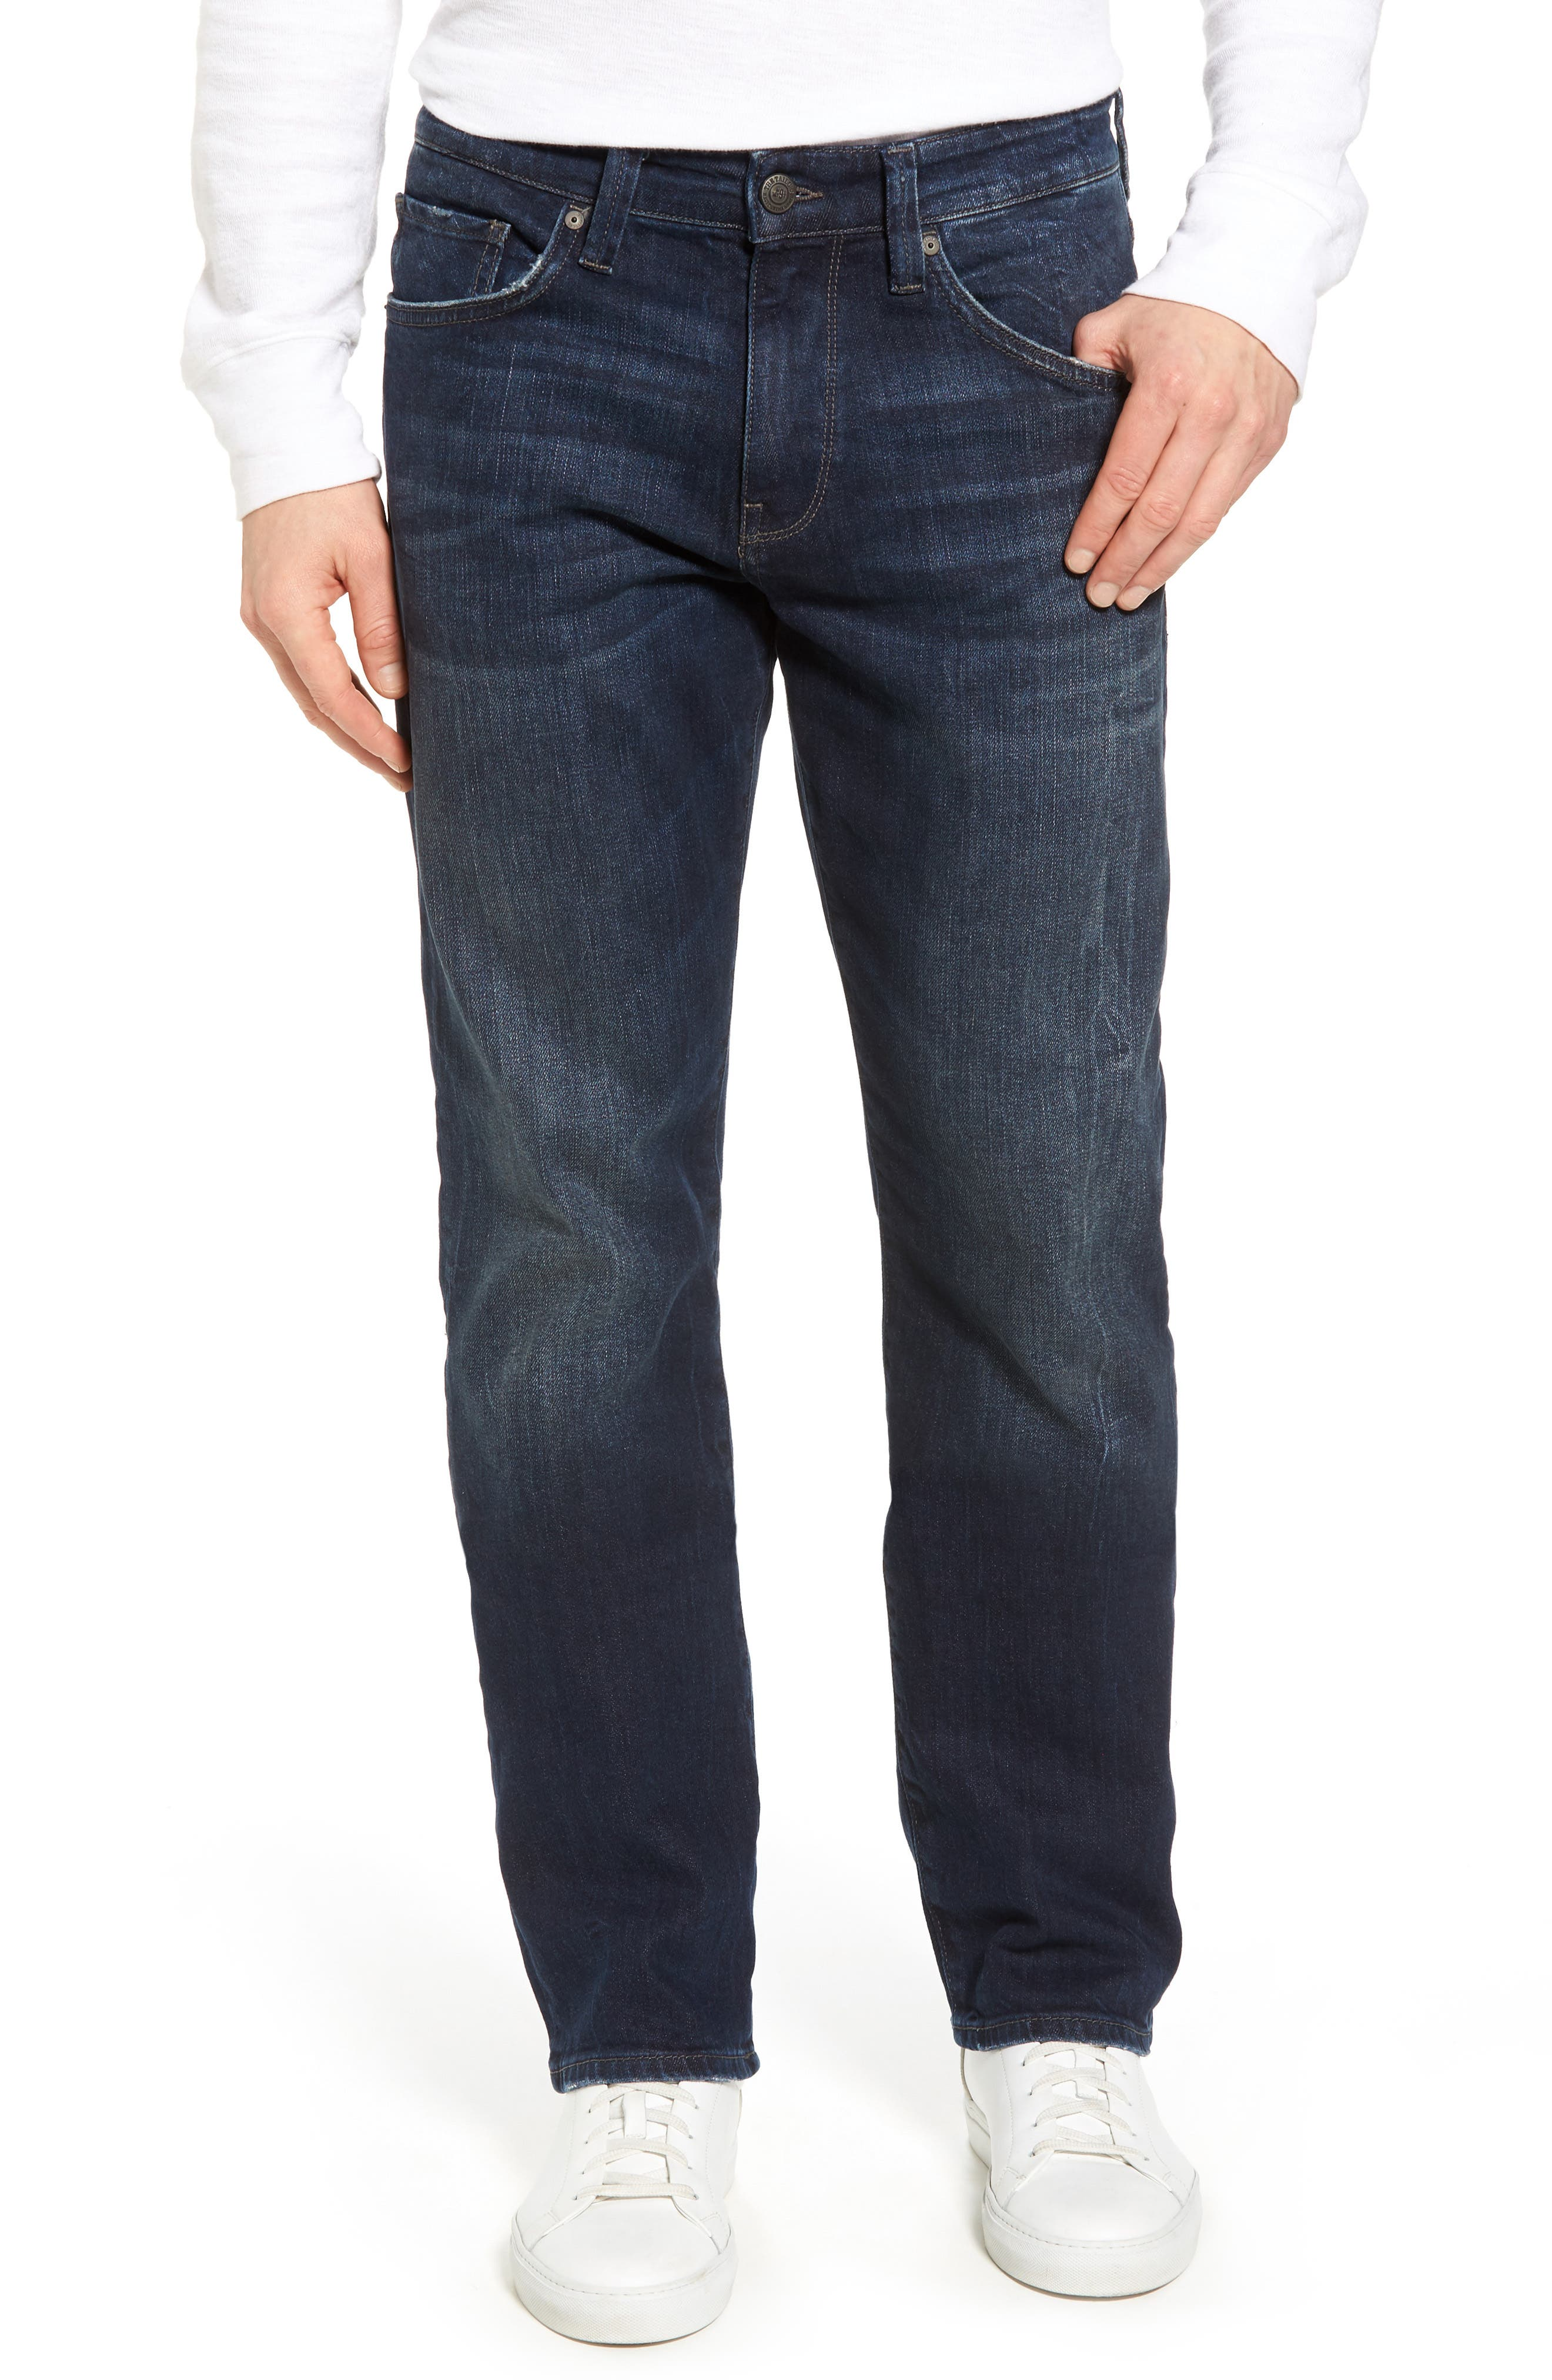 Mavi Jeans Myles Straight Leg Jeans (Deep Brooklyn)